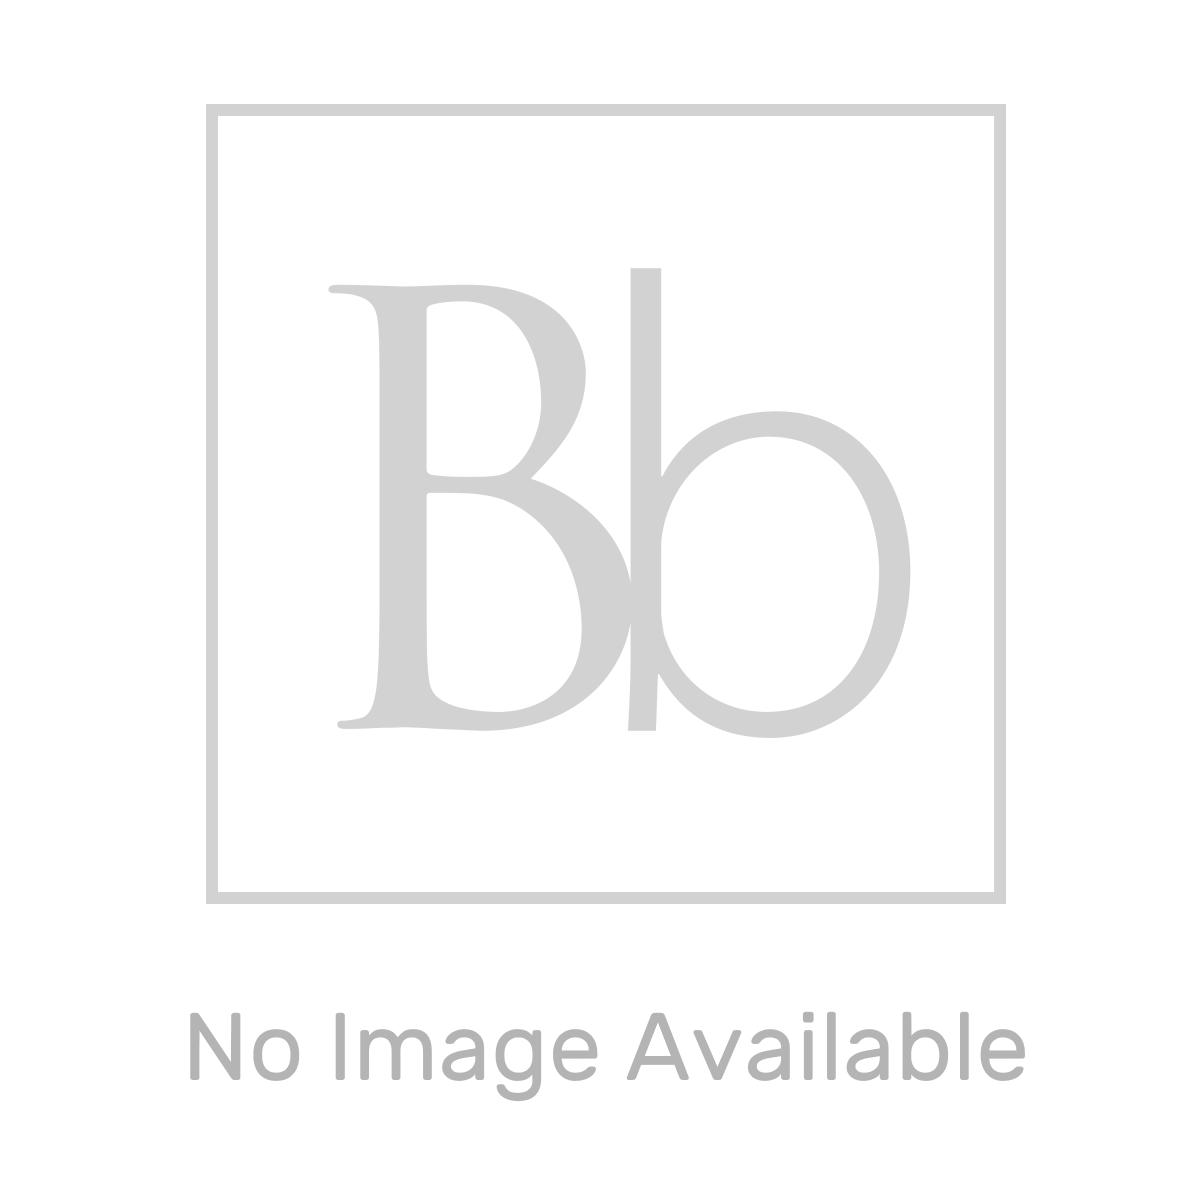 RAK Scorpio Heated LED Mirror 800 x 800 Lifestyle